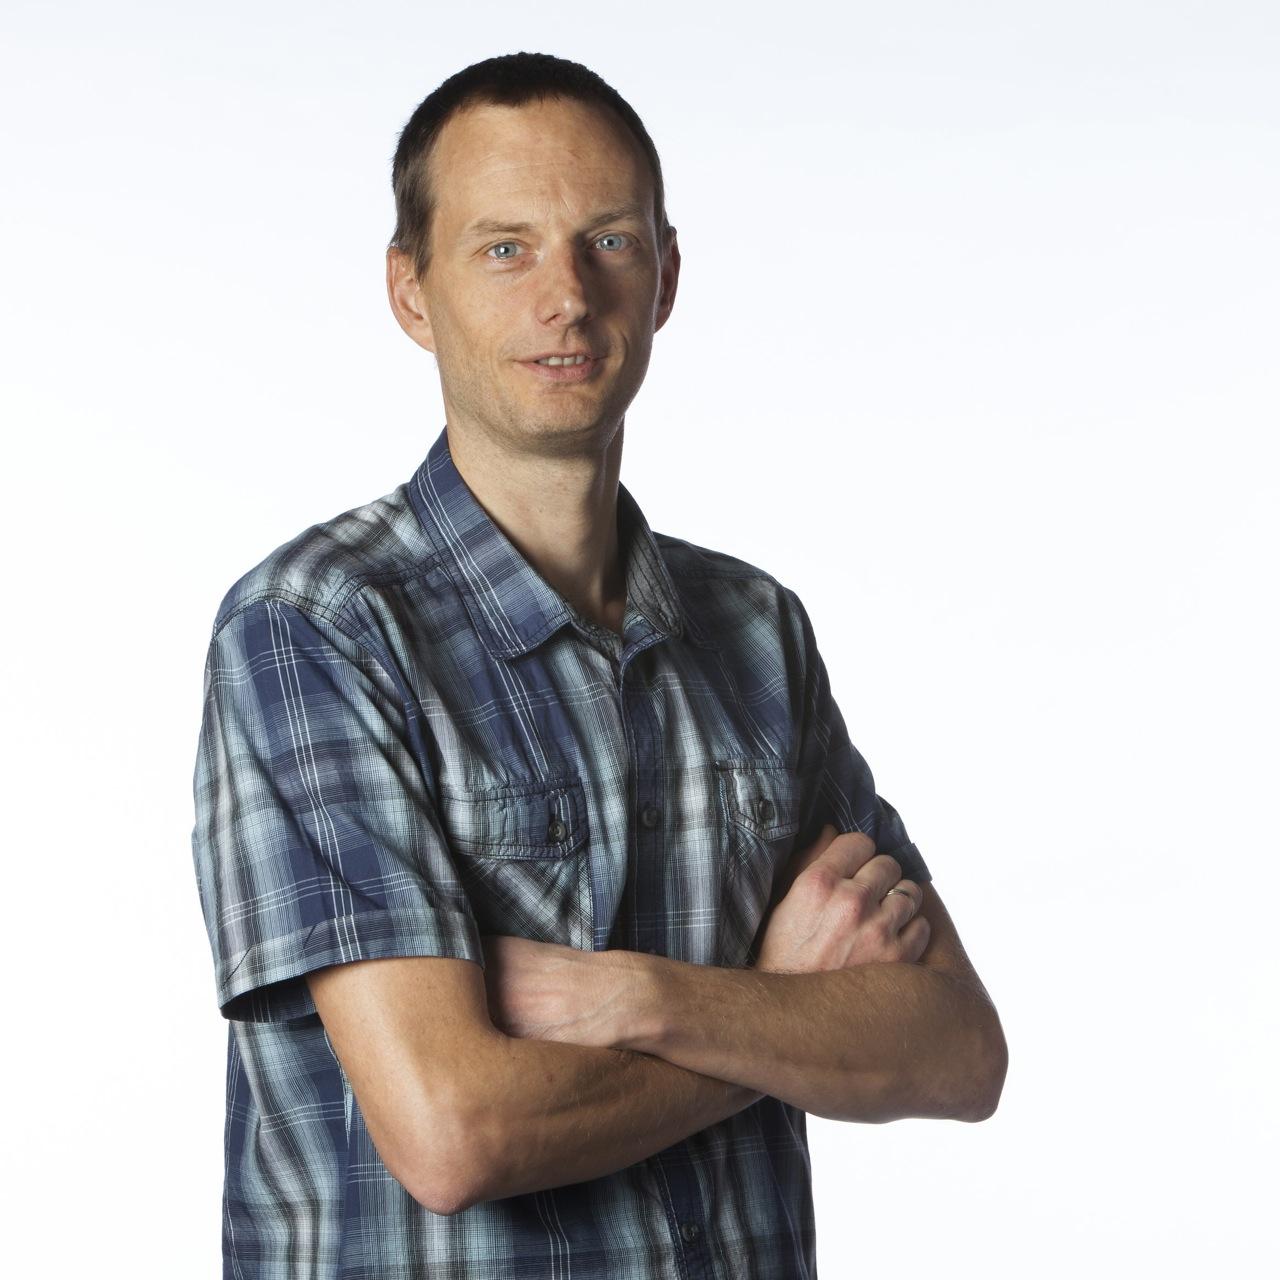 Bart Dewaele